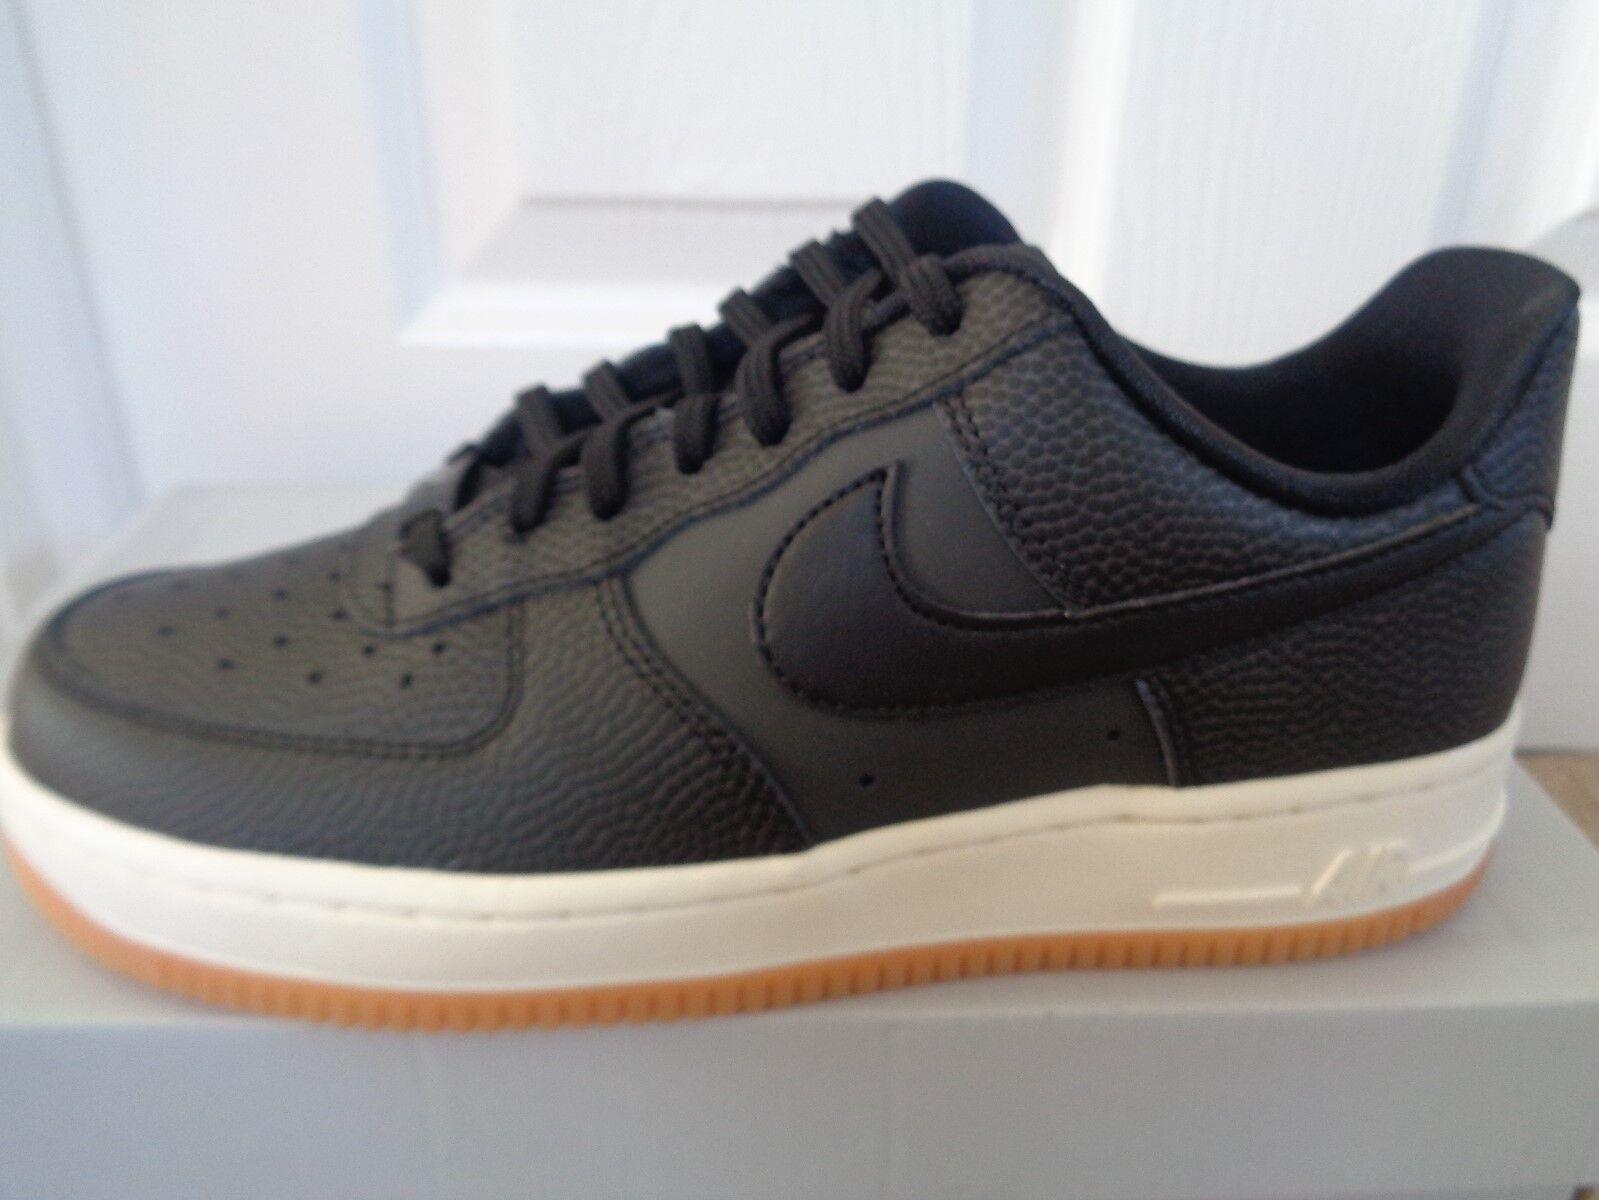 Nike Air Obliger 1 '07 Seasonal wmns trainers 818594 003 uk 4.5 eu 38 us 7 NEW+BOX